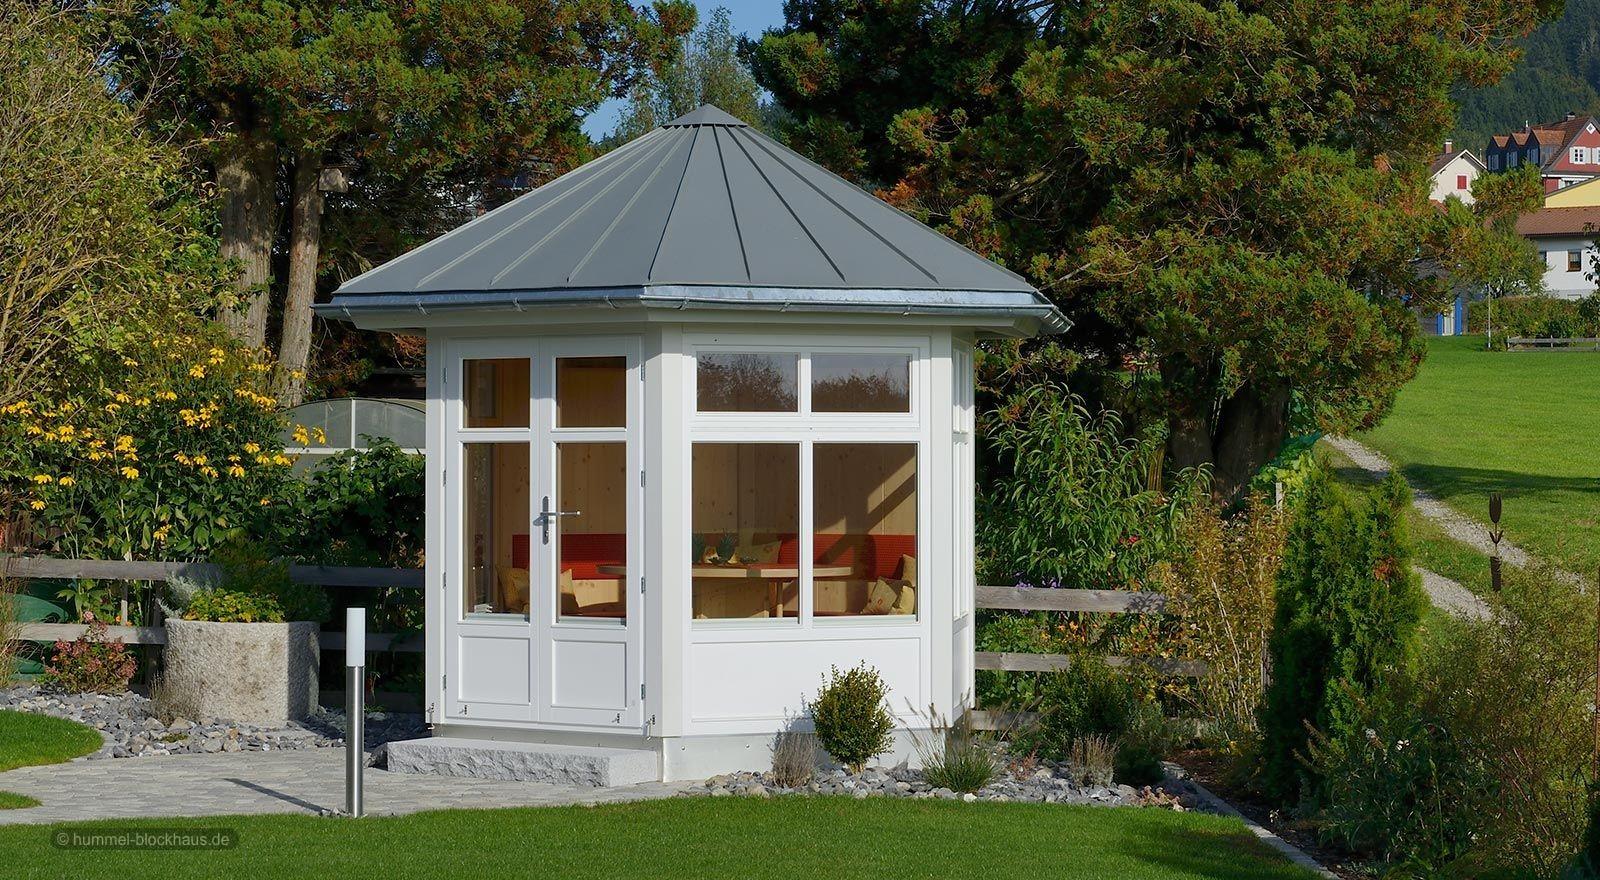 gartenpavillon modern mediona hummel blockhaus. Black Bedroom Furniture Sets. Home Design Ideas